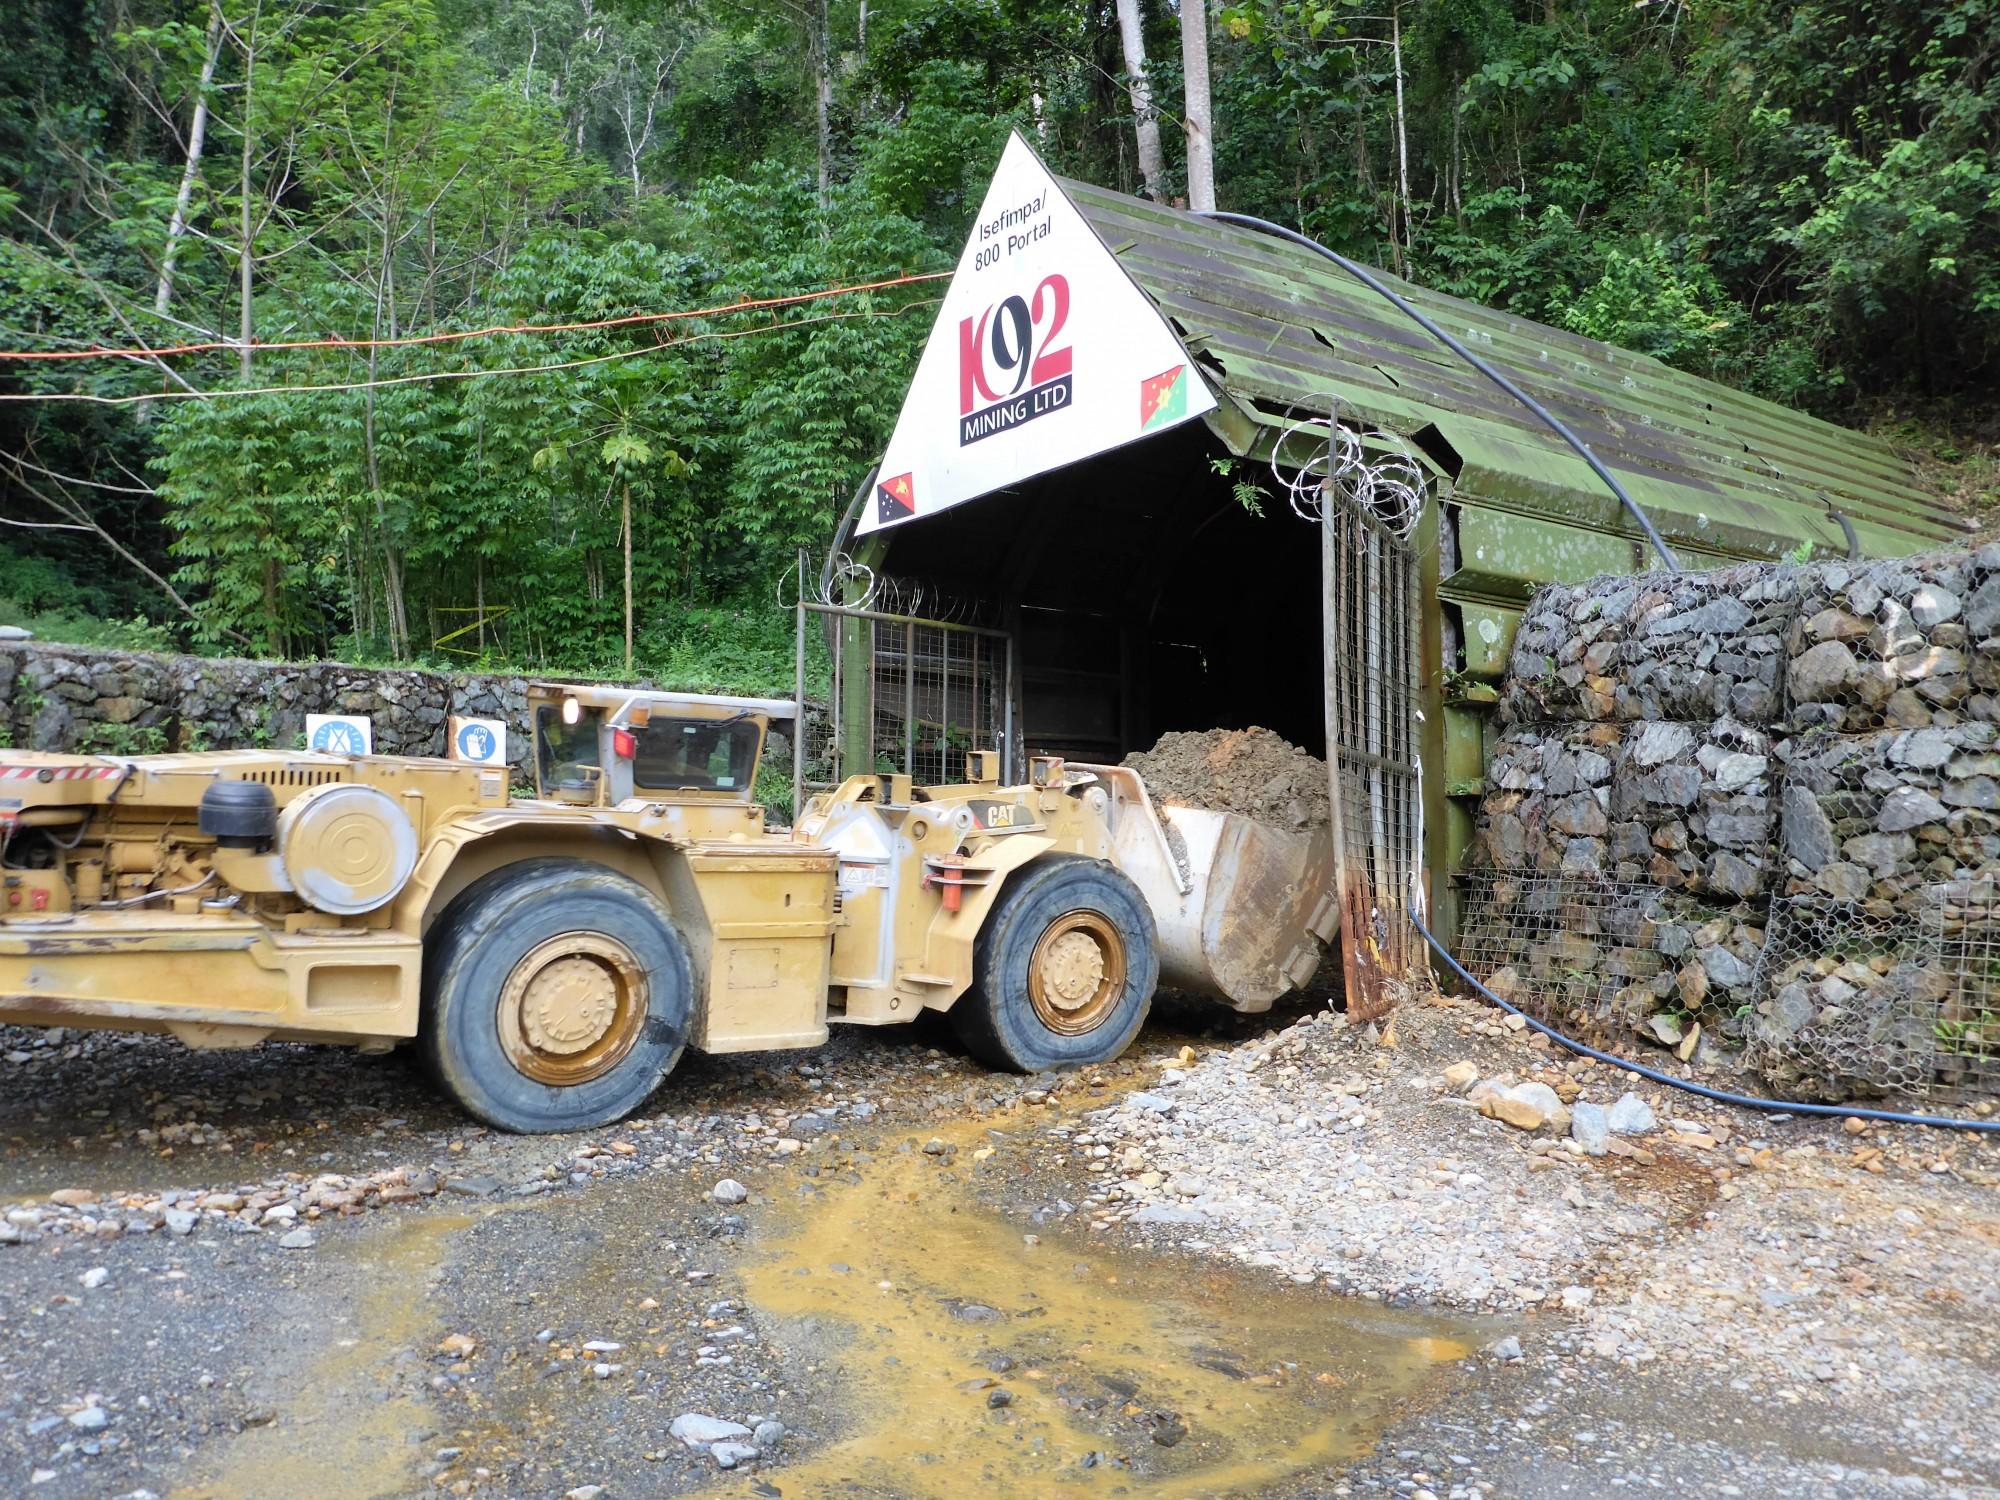 Congratulations to K92 Mining Inc.